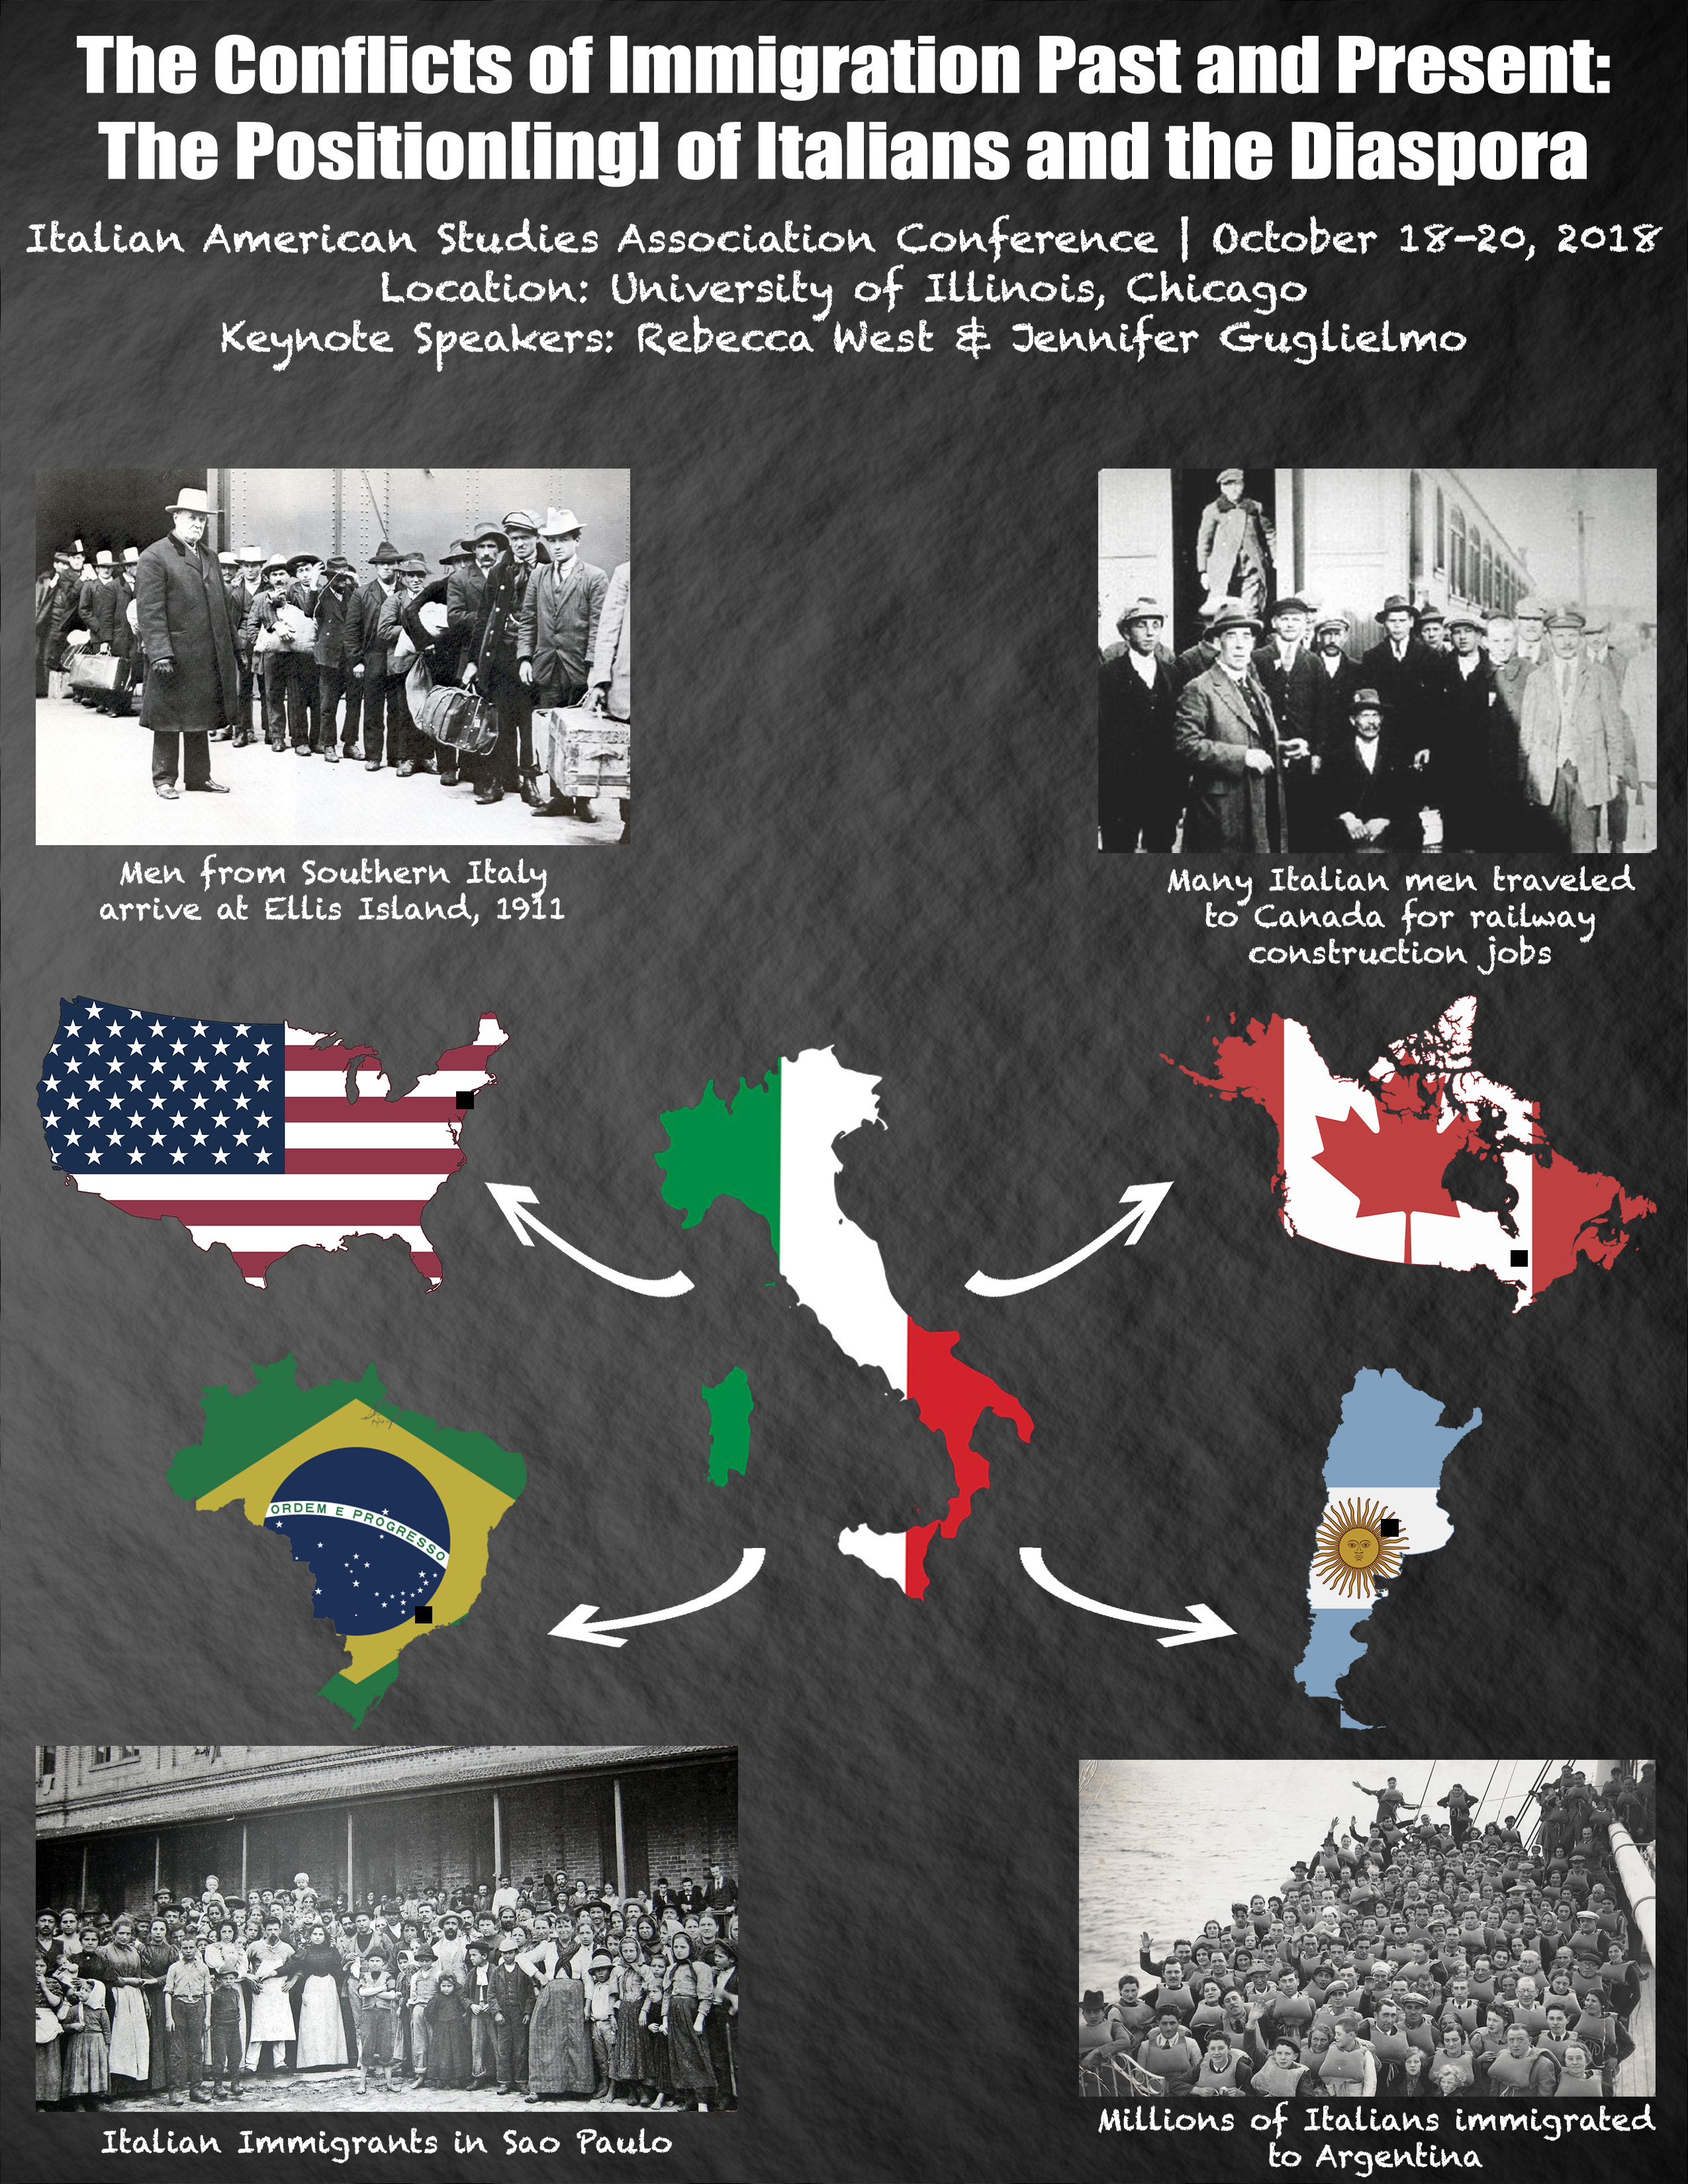 c3e6d98c7f0 2018 Italian American Studies Association (IASA) Conference